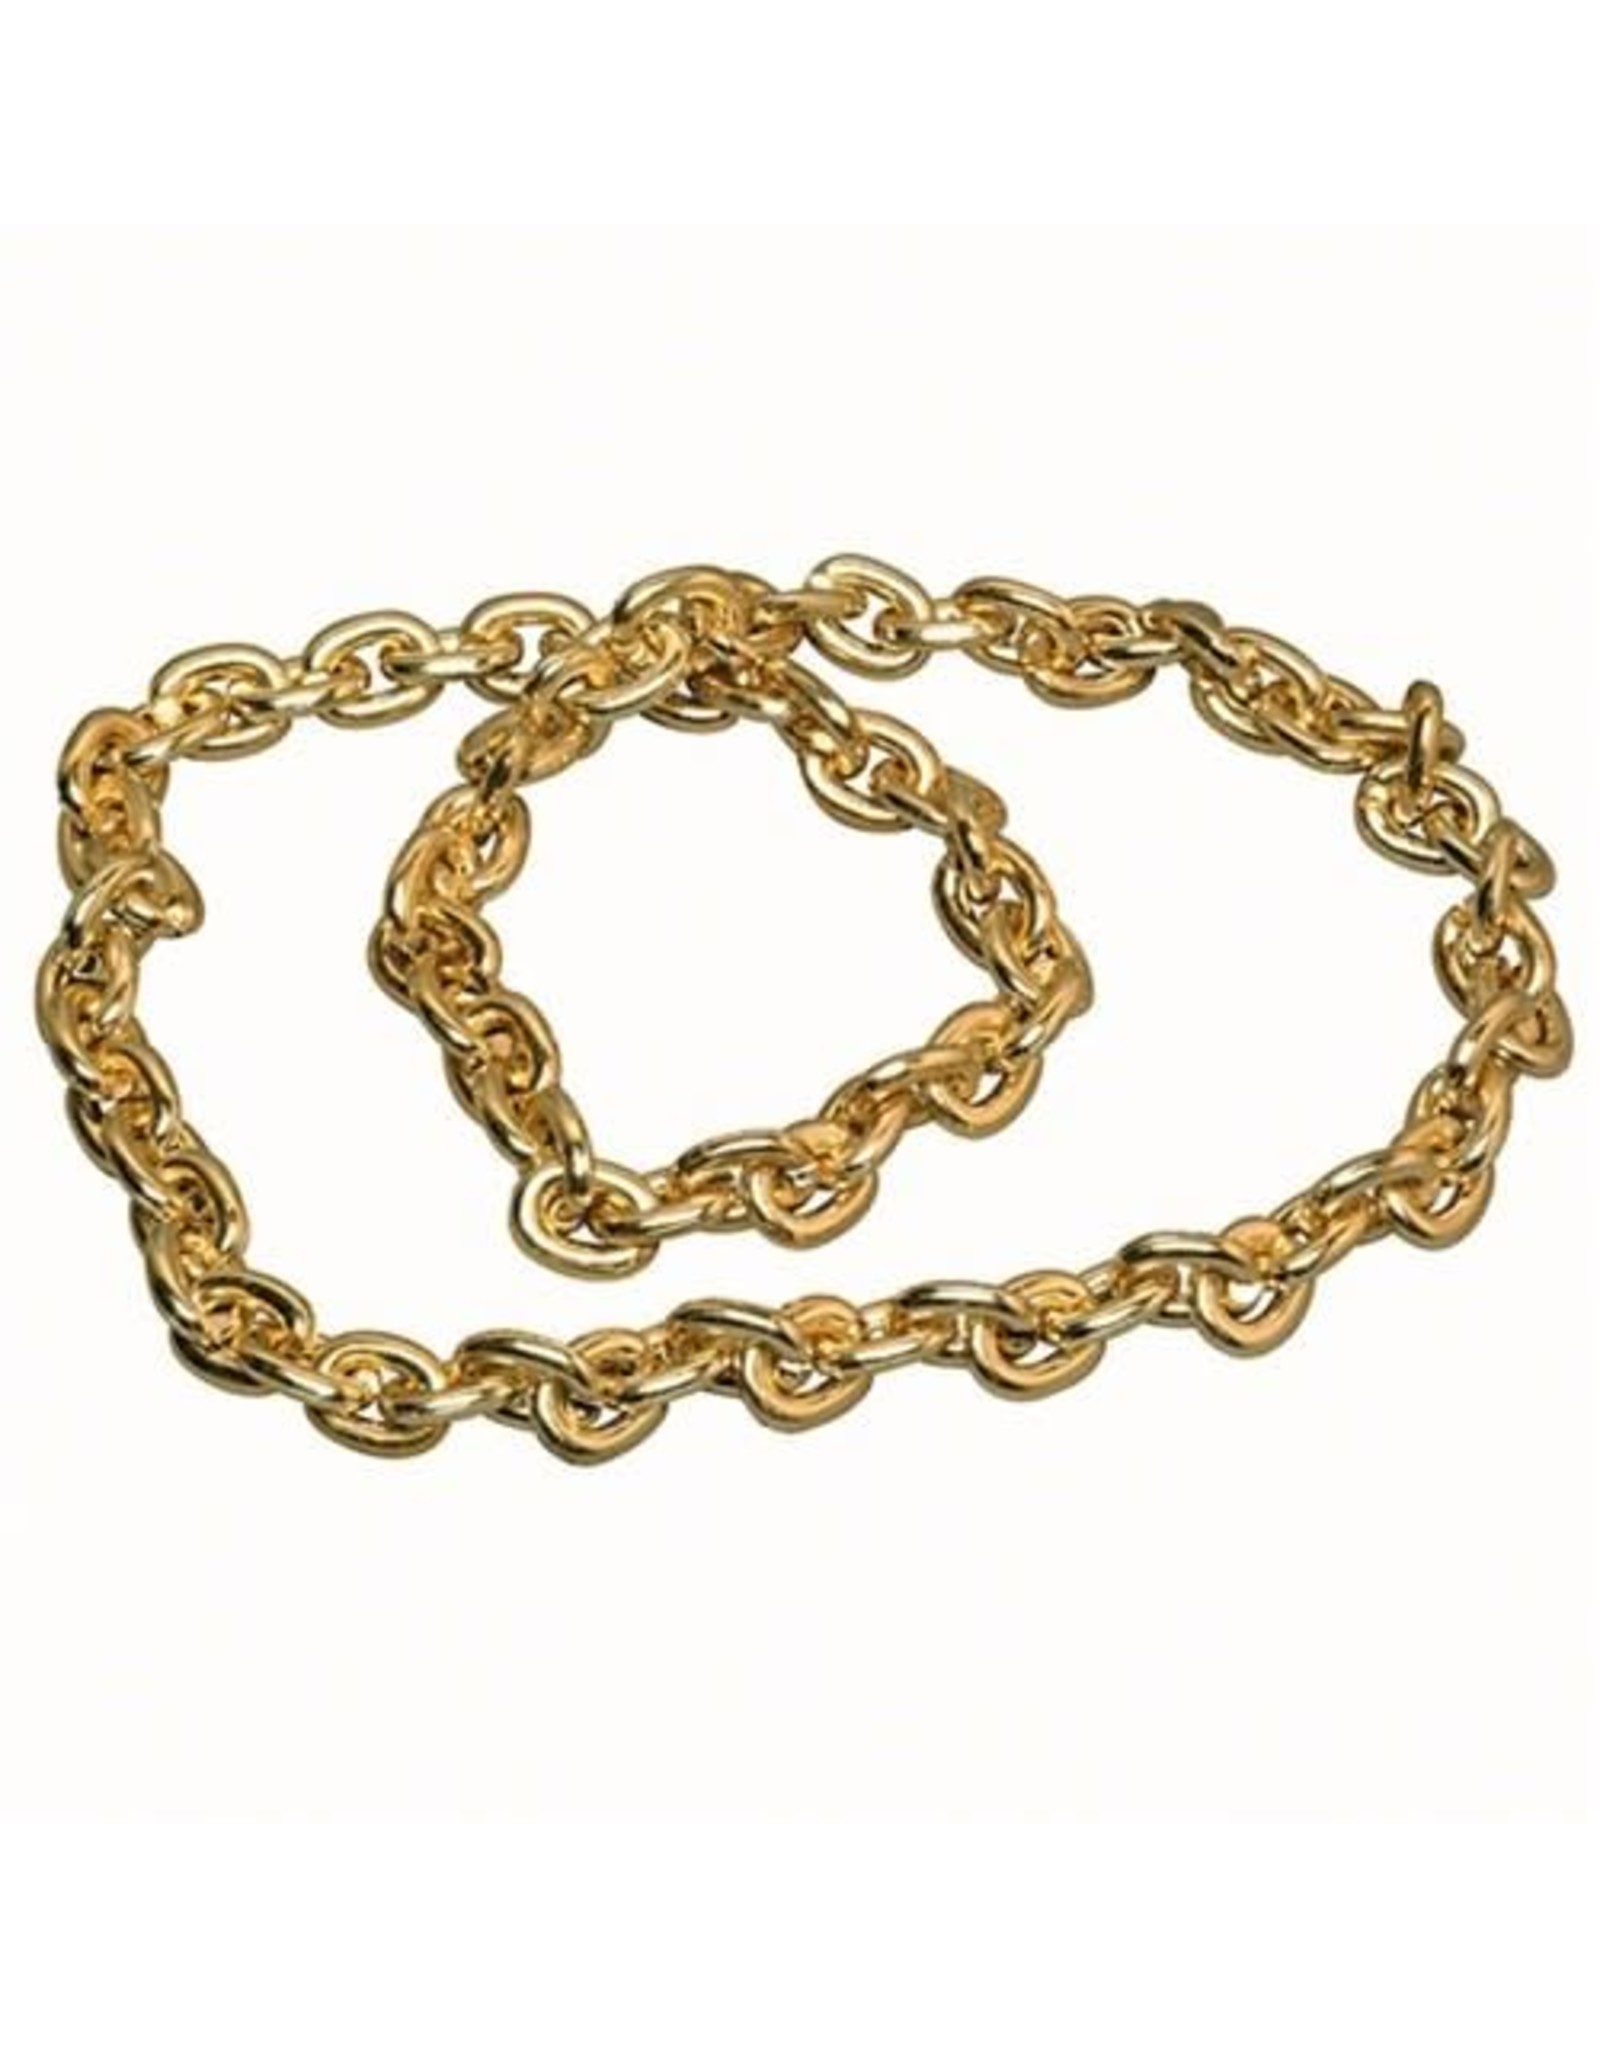 Dillon Gold Chain 40